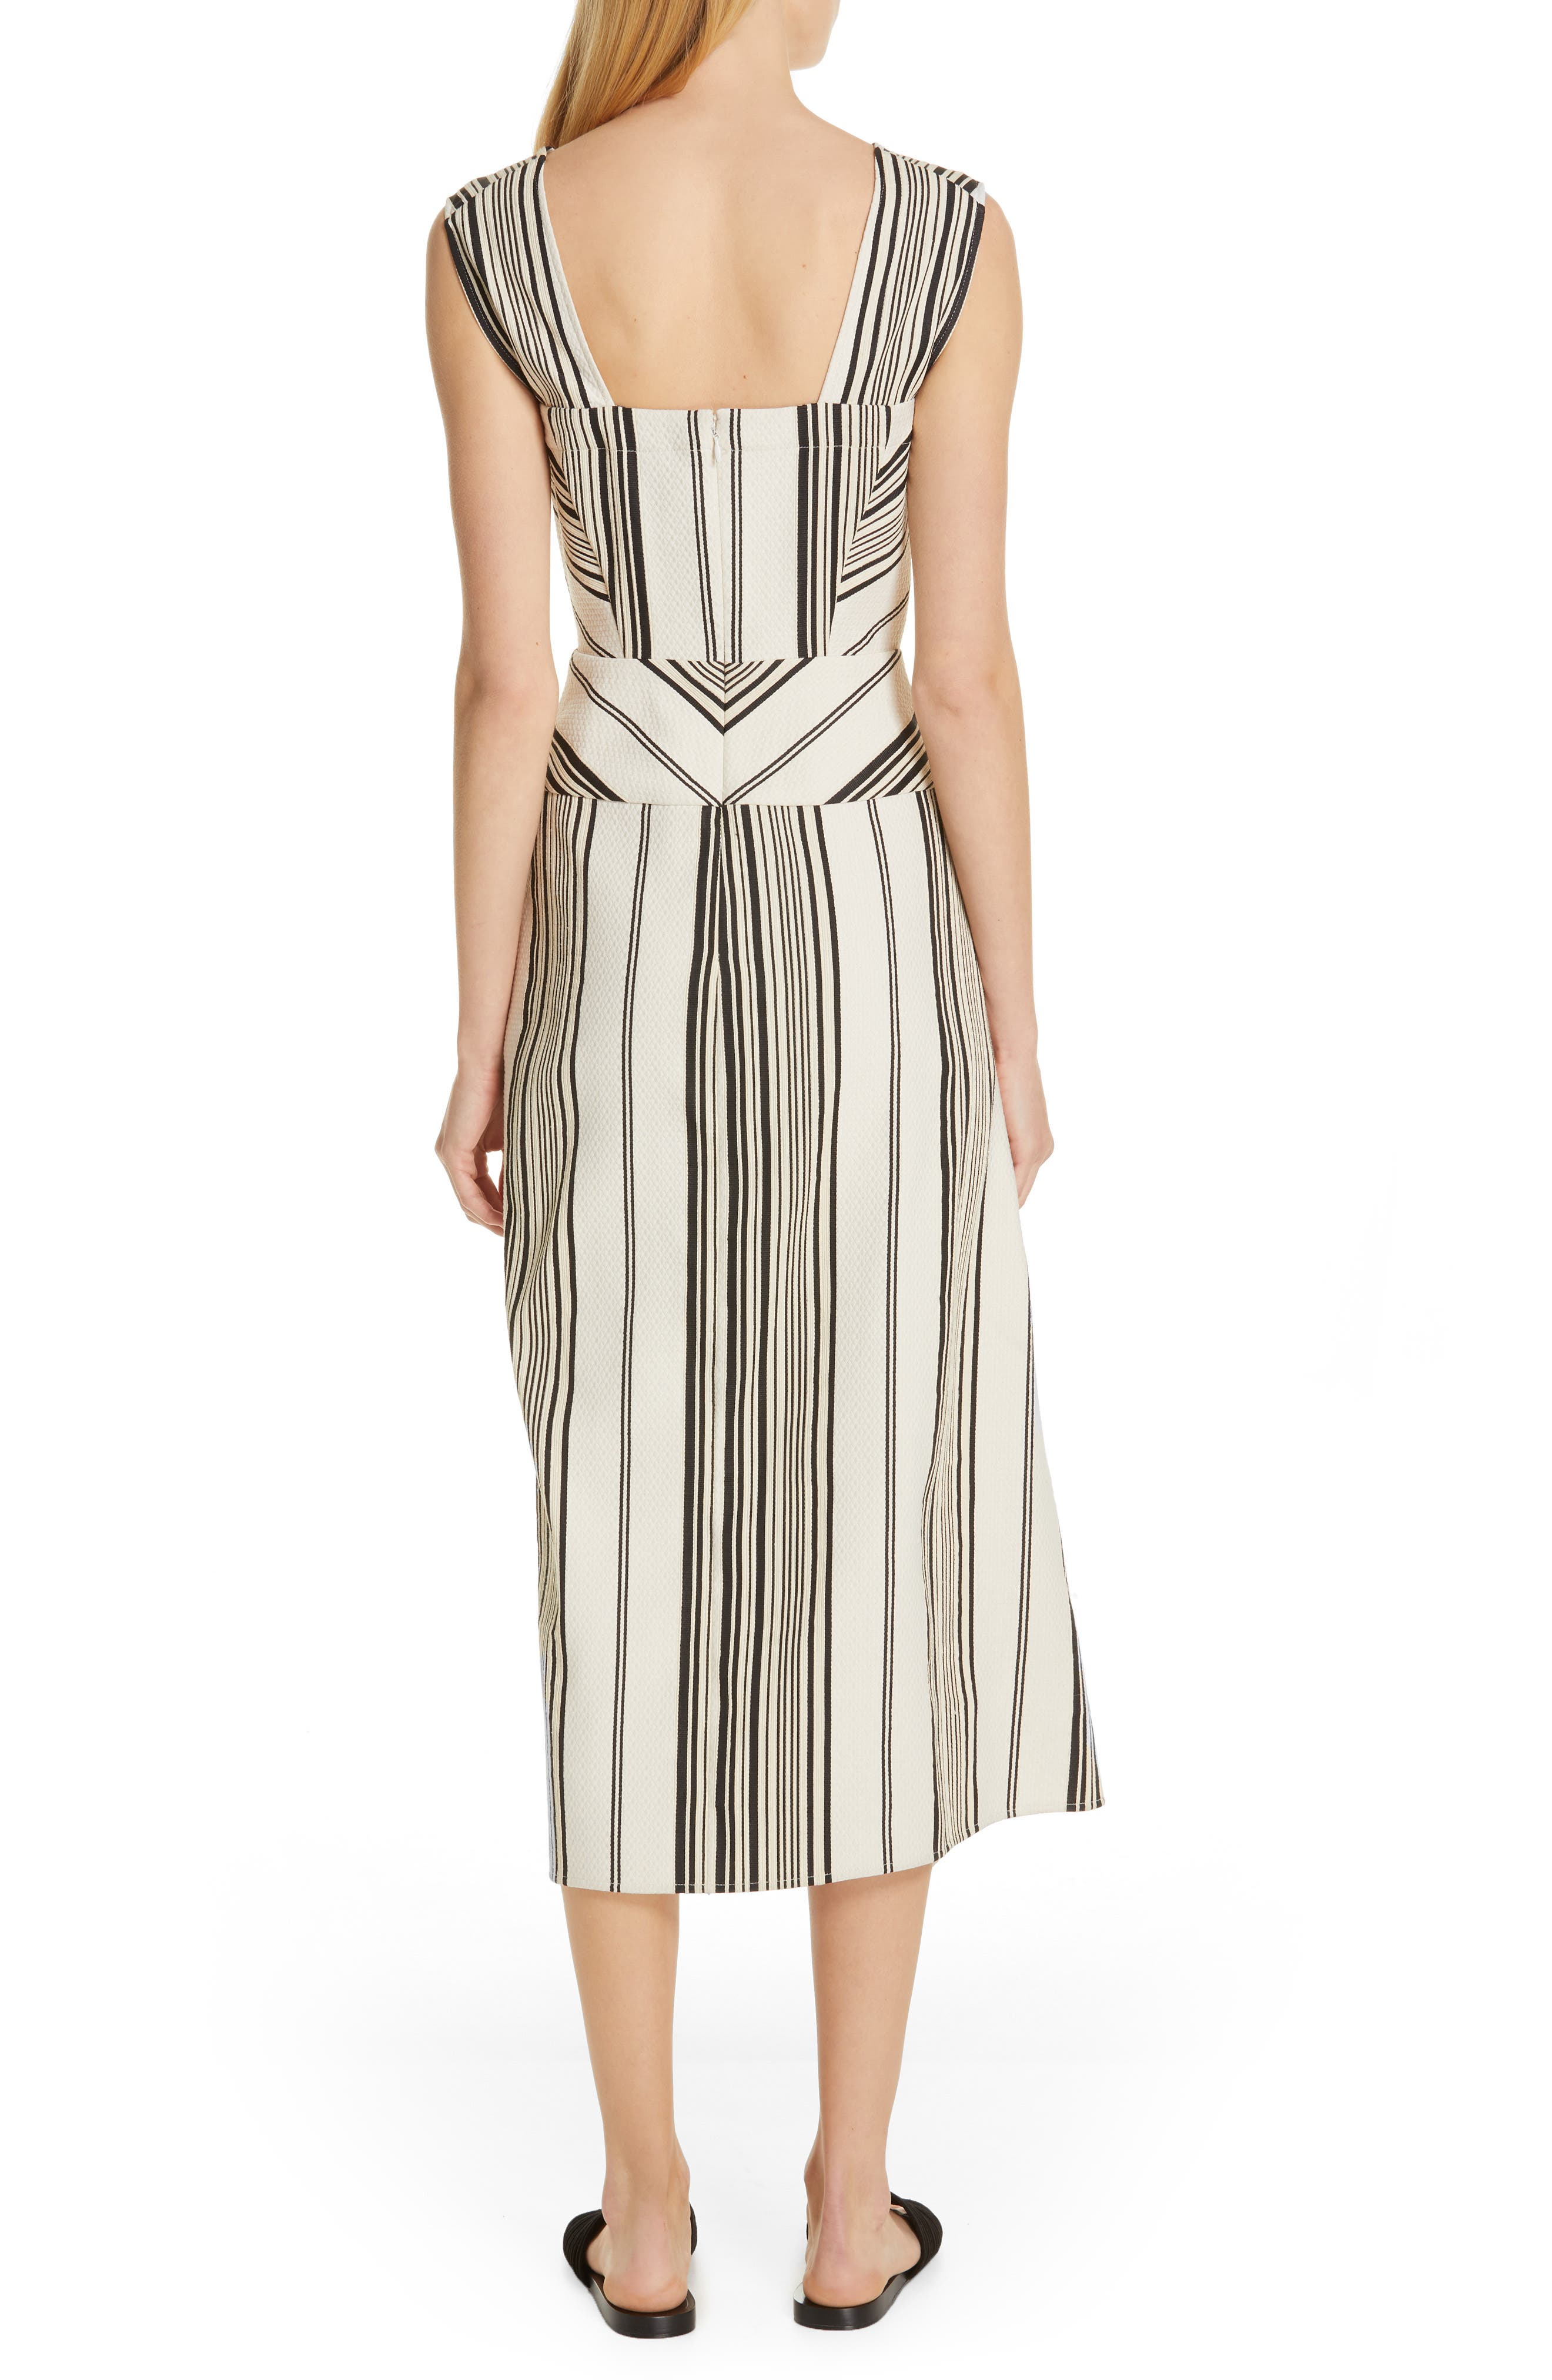 Eve Ero Dress,                             Alternate thumbnail 2, color,                             BLACK/ GREIGE